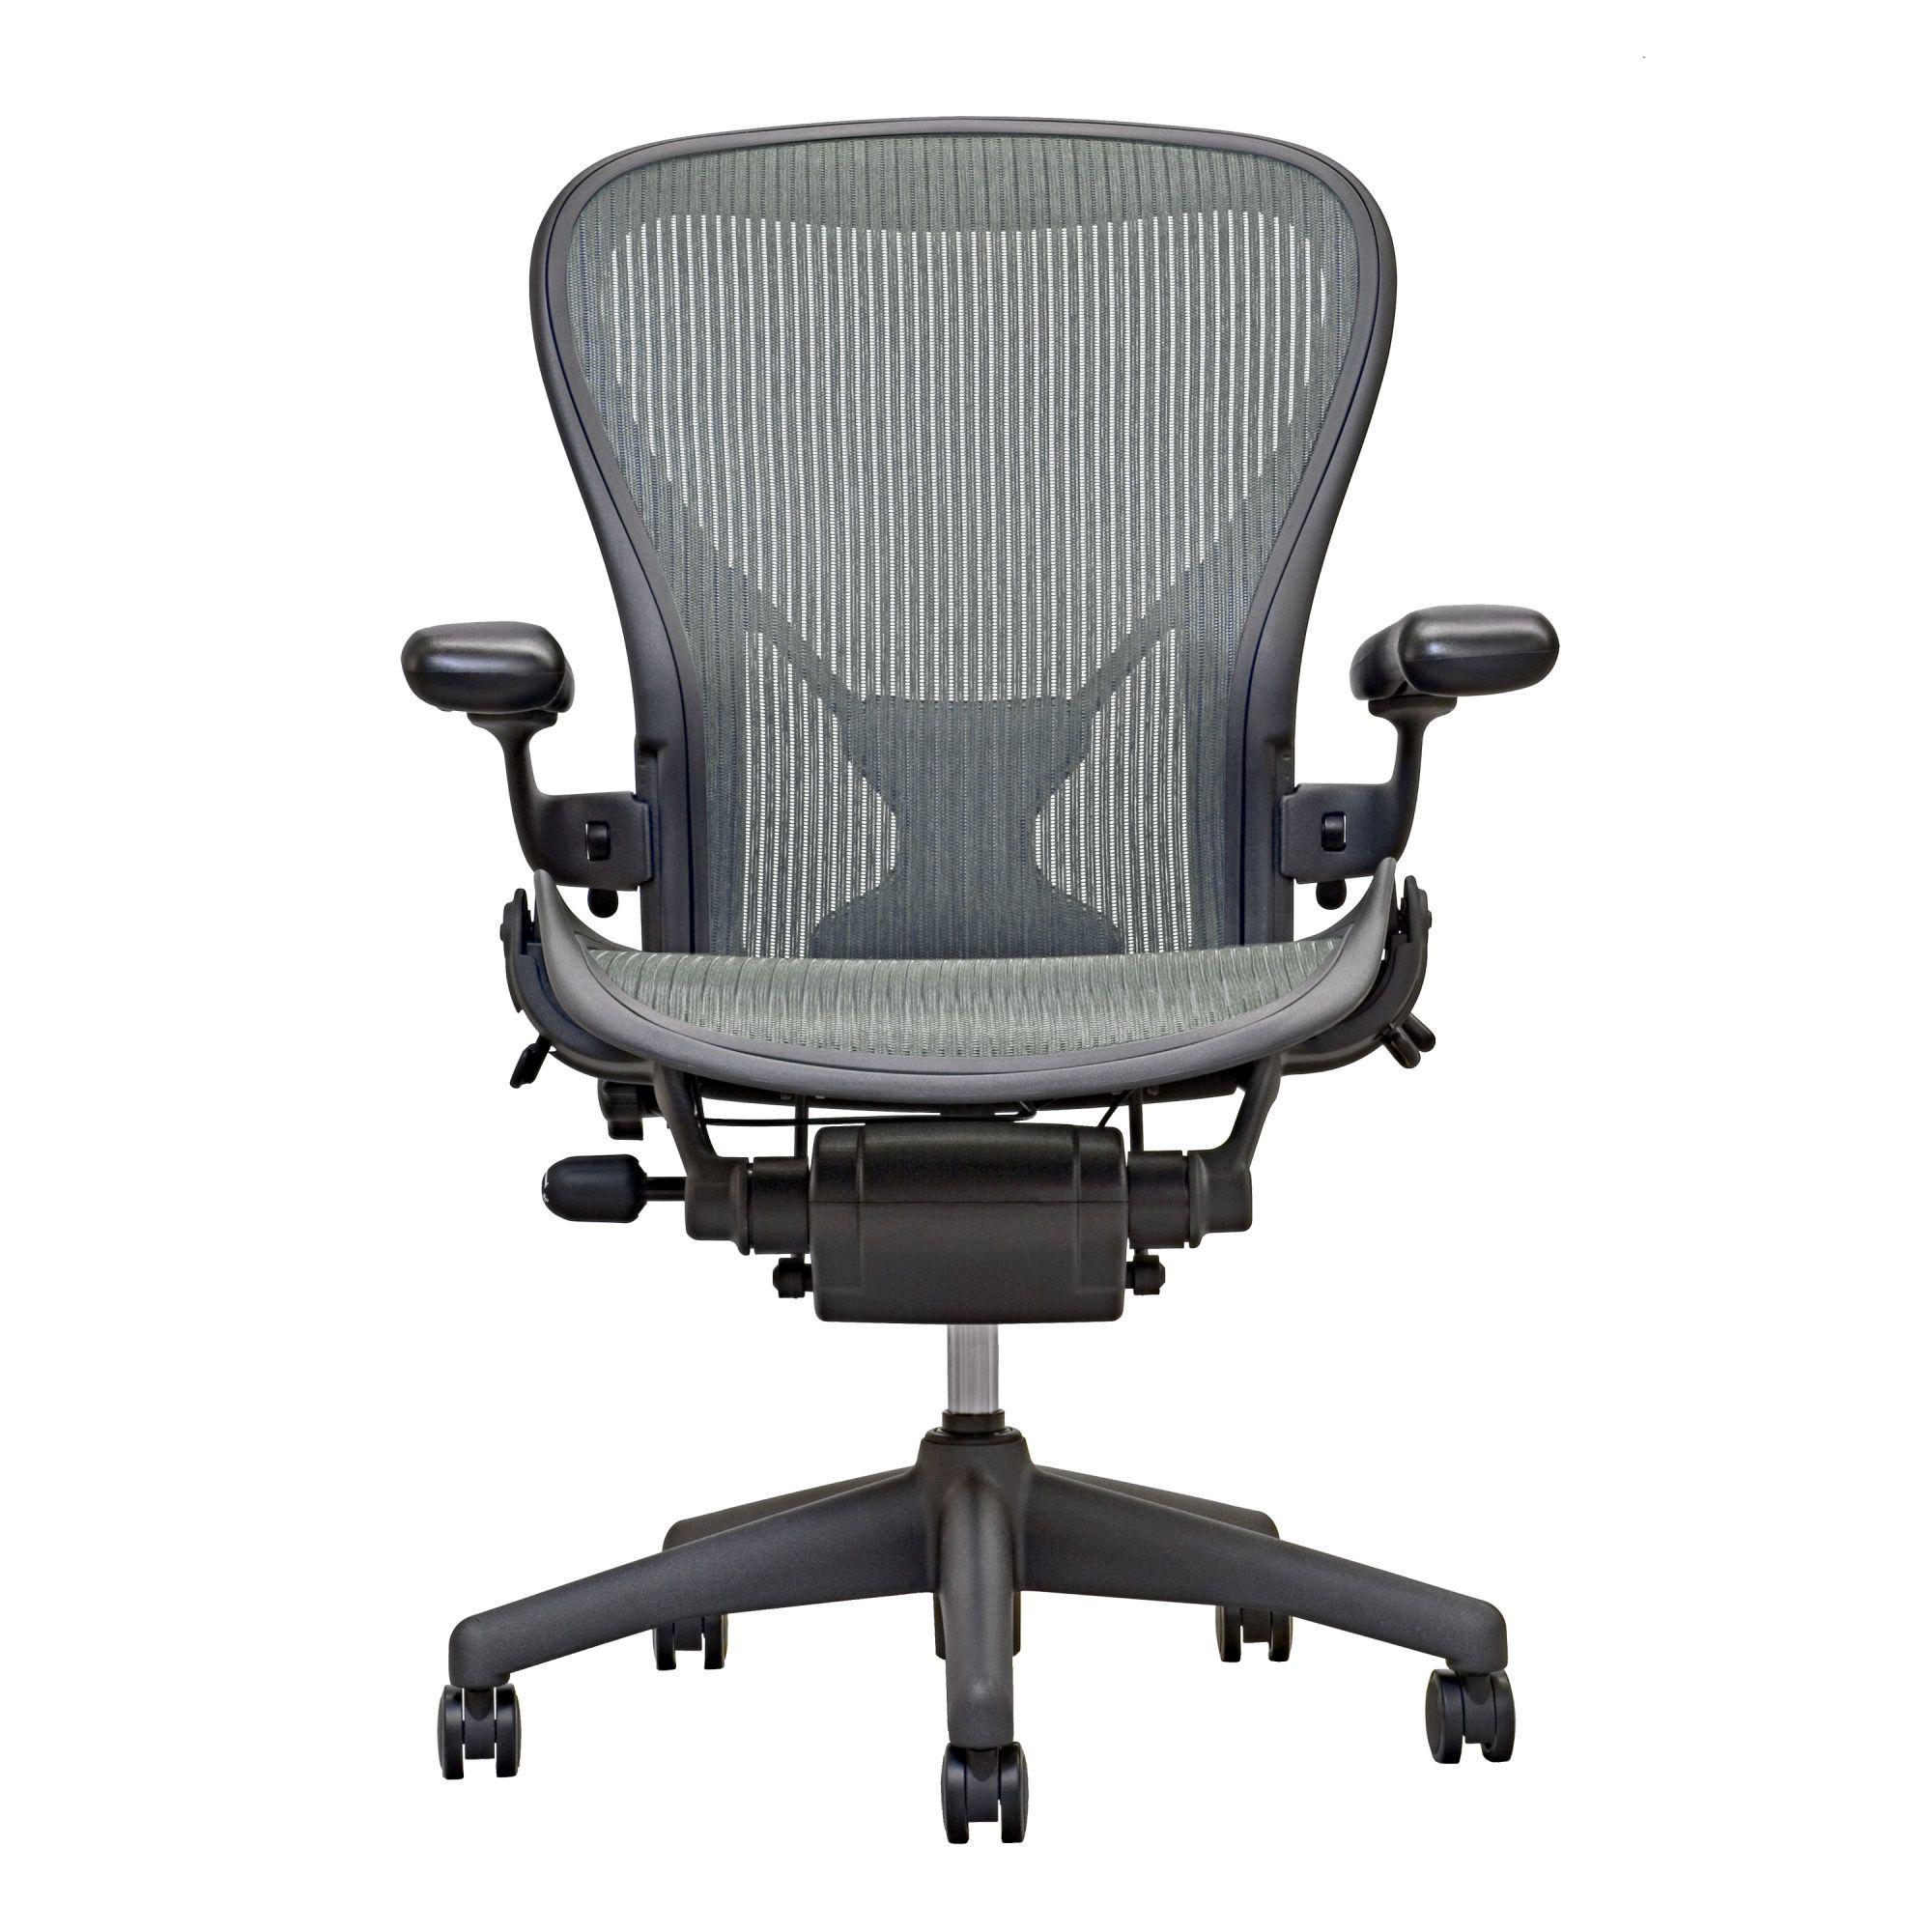 Aeron Chair By Herman Miller Posture Fit Lead 668 88